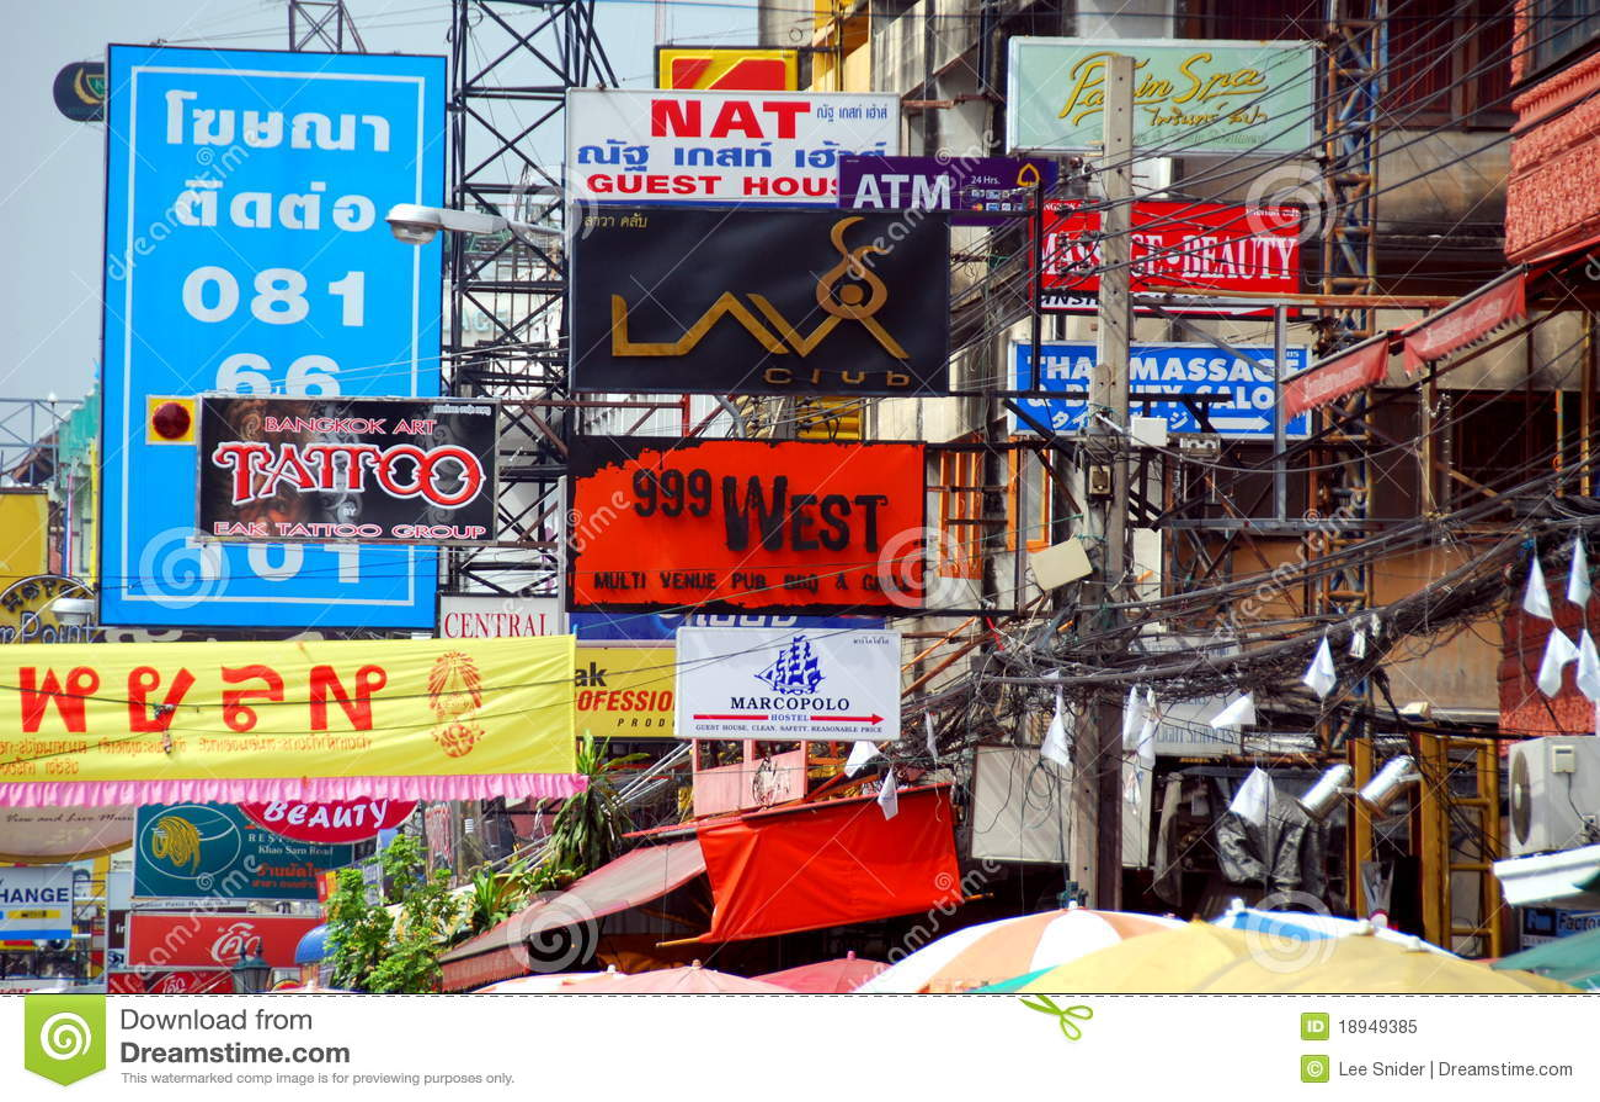 Banguecoque, Tailândia: Sinais de estrada de Khao San